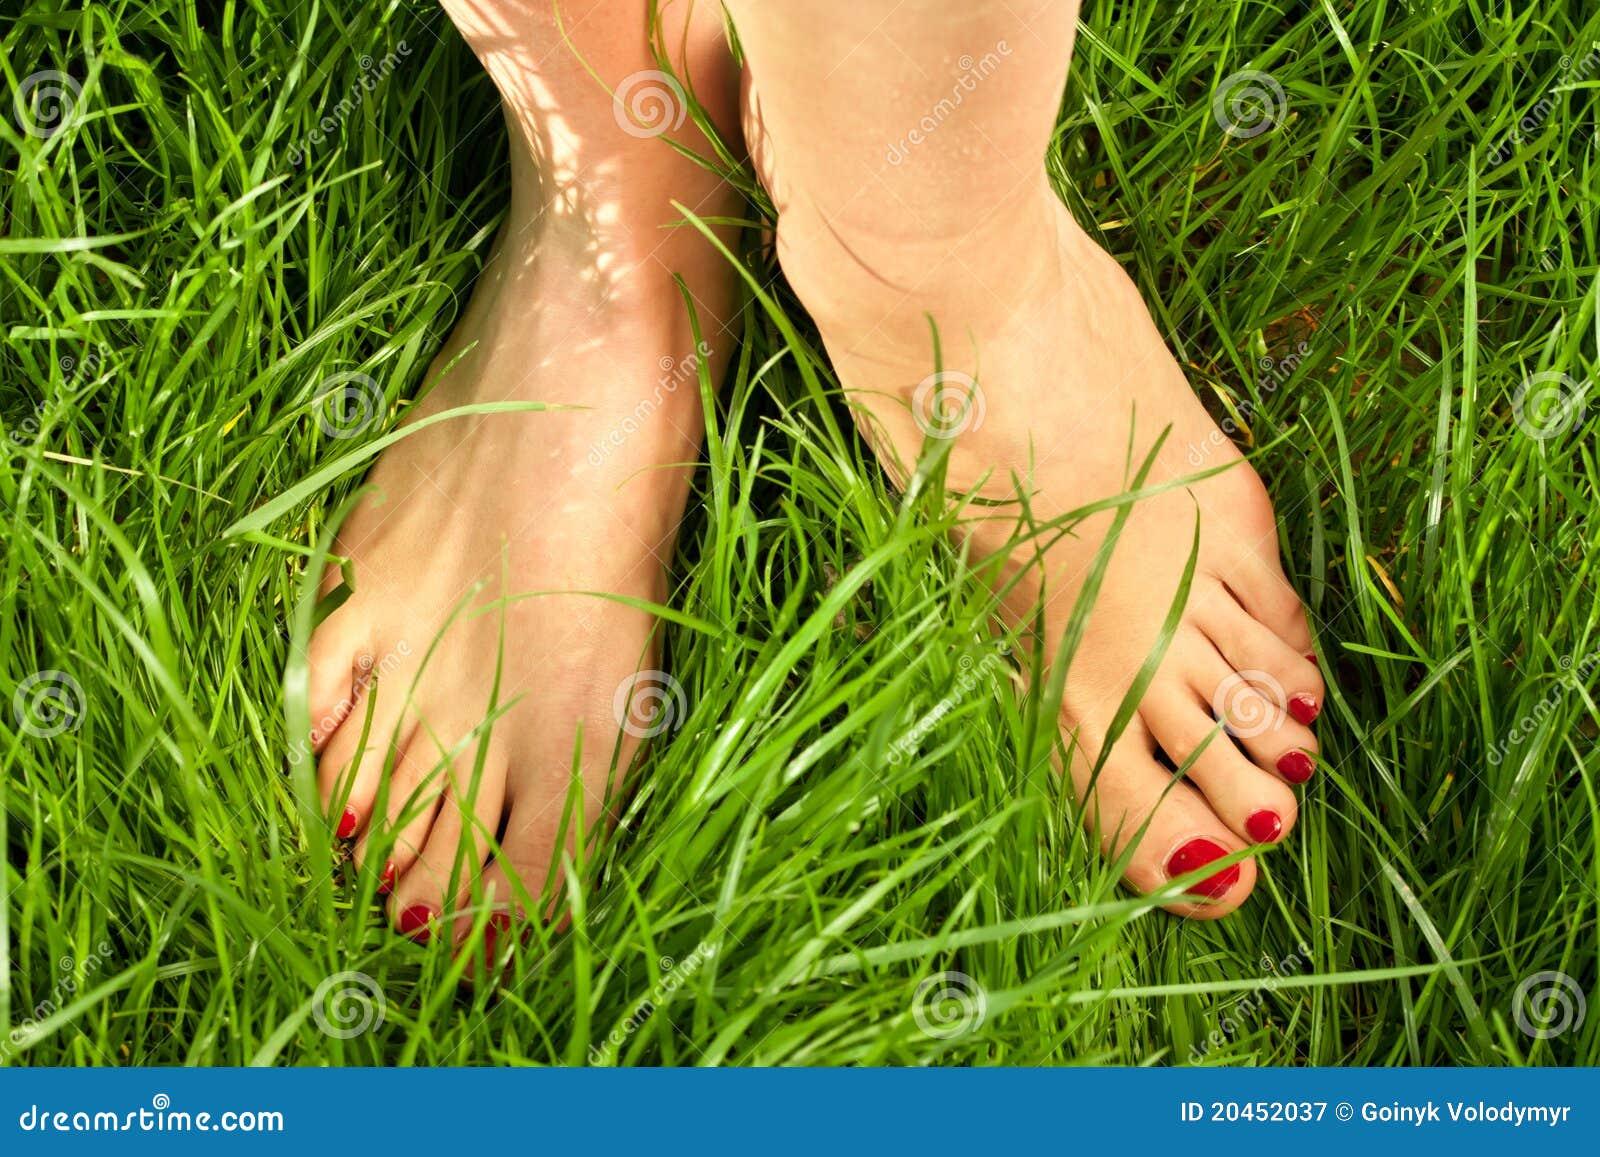 Theme woman bare feet